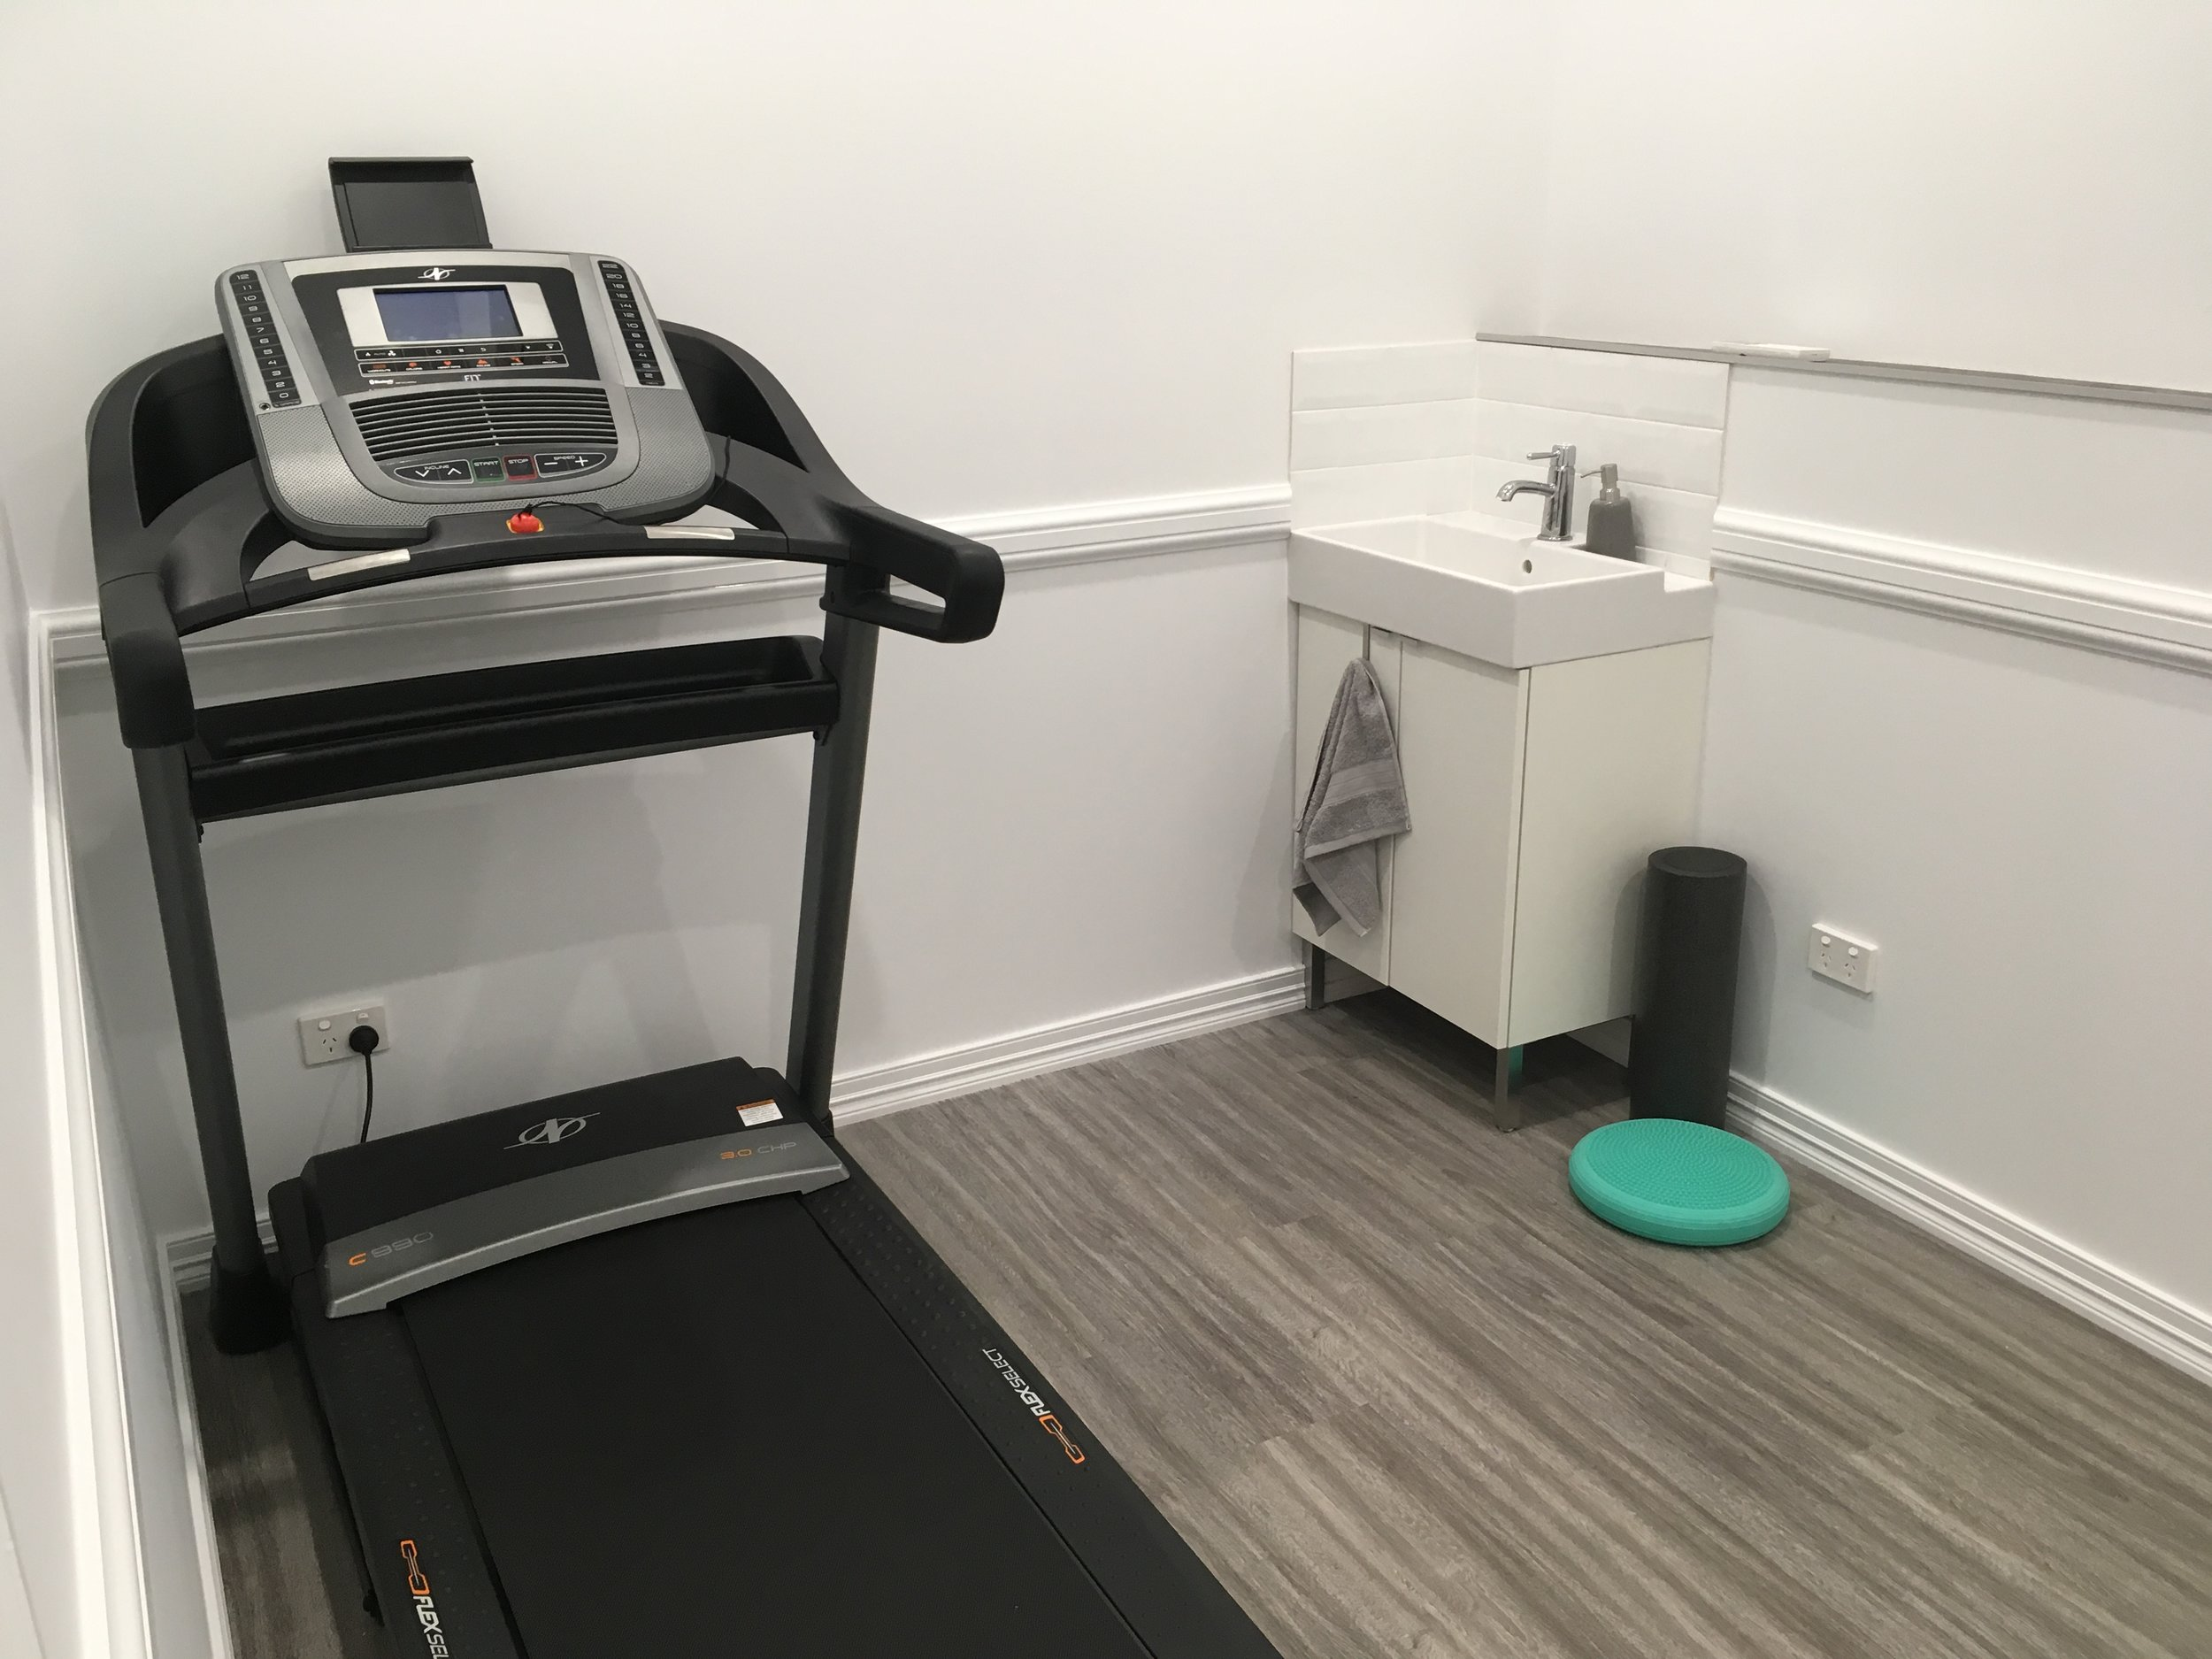 Treadmill assessment